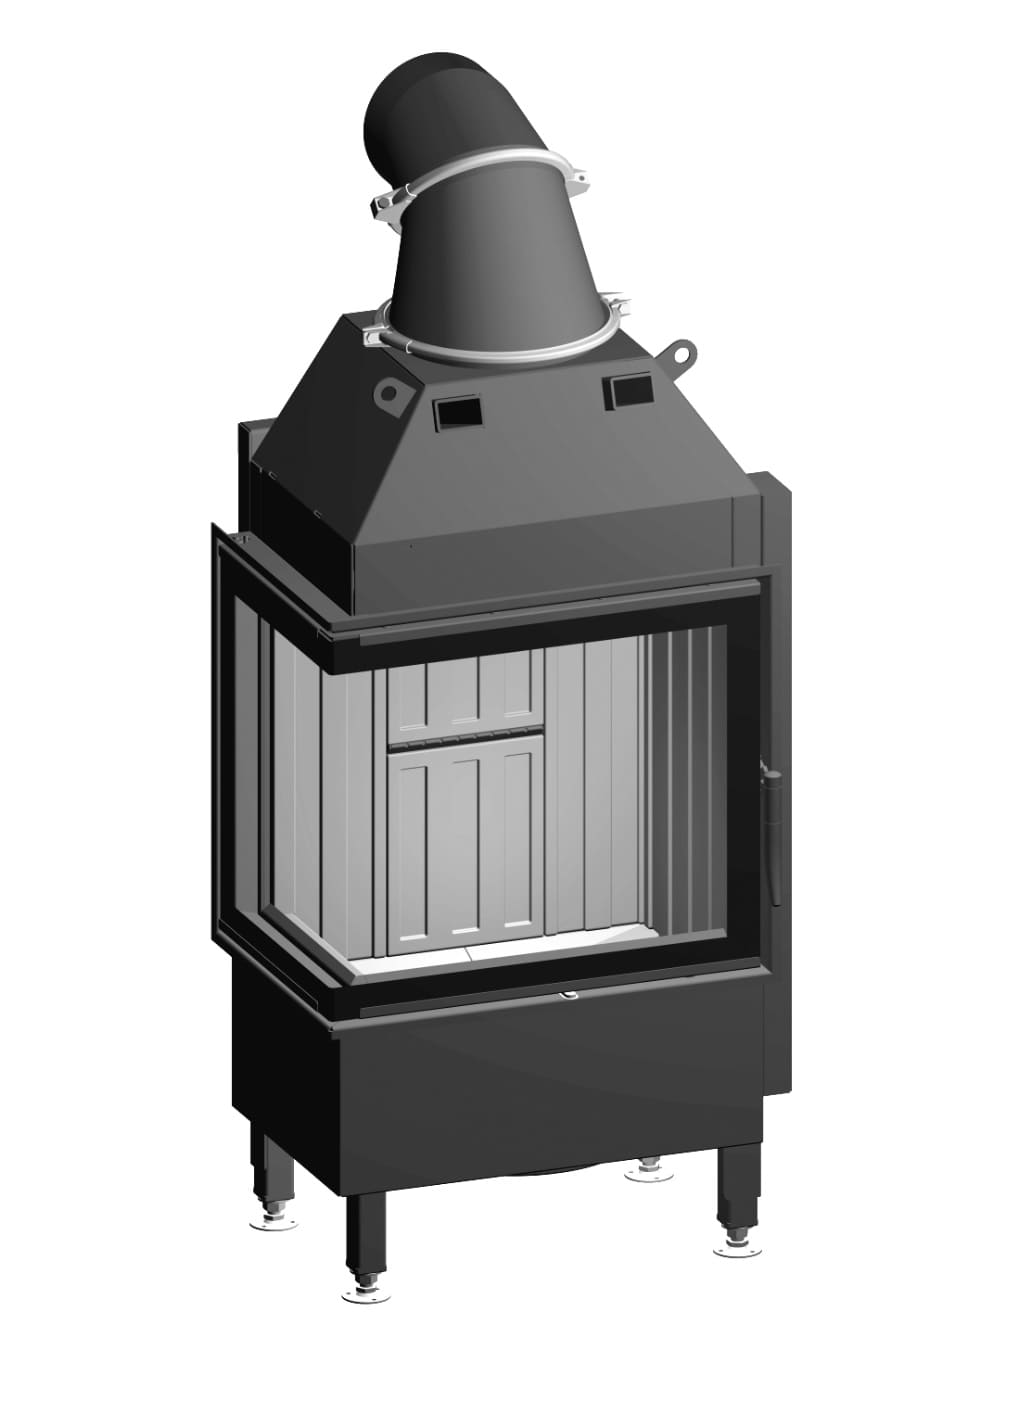 Varia 2L-55-4S